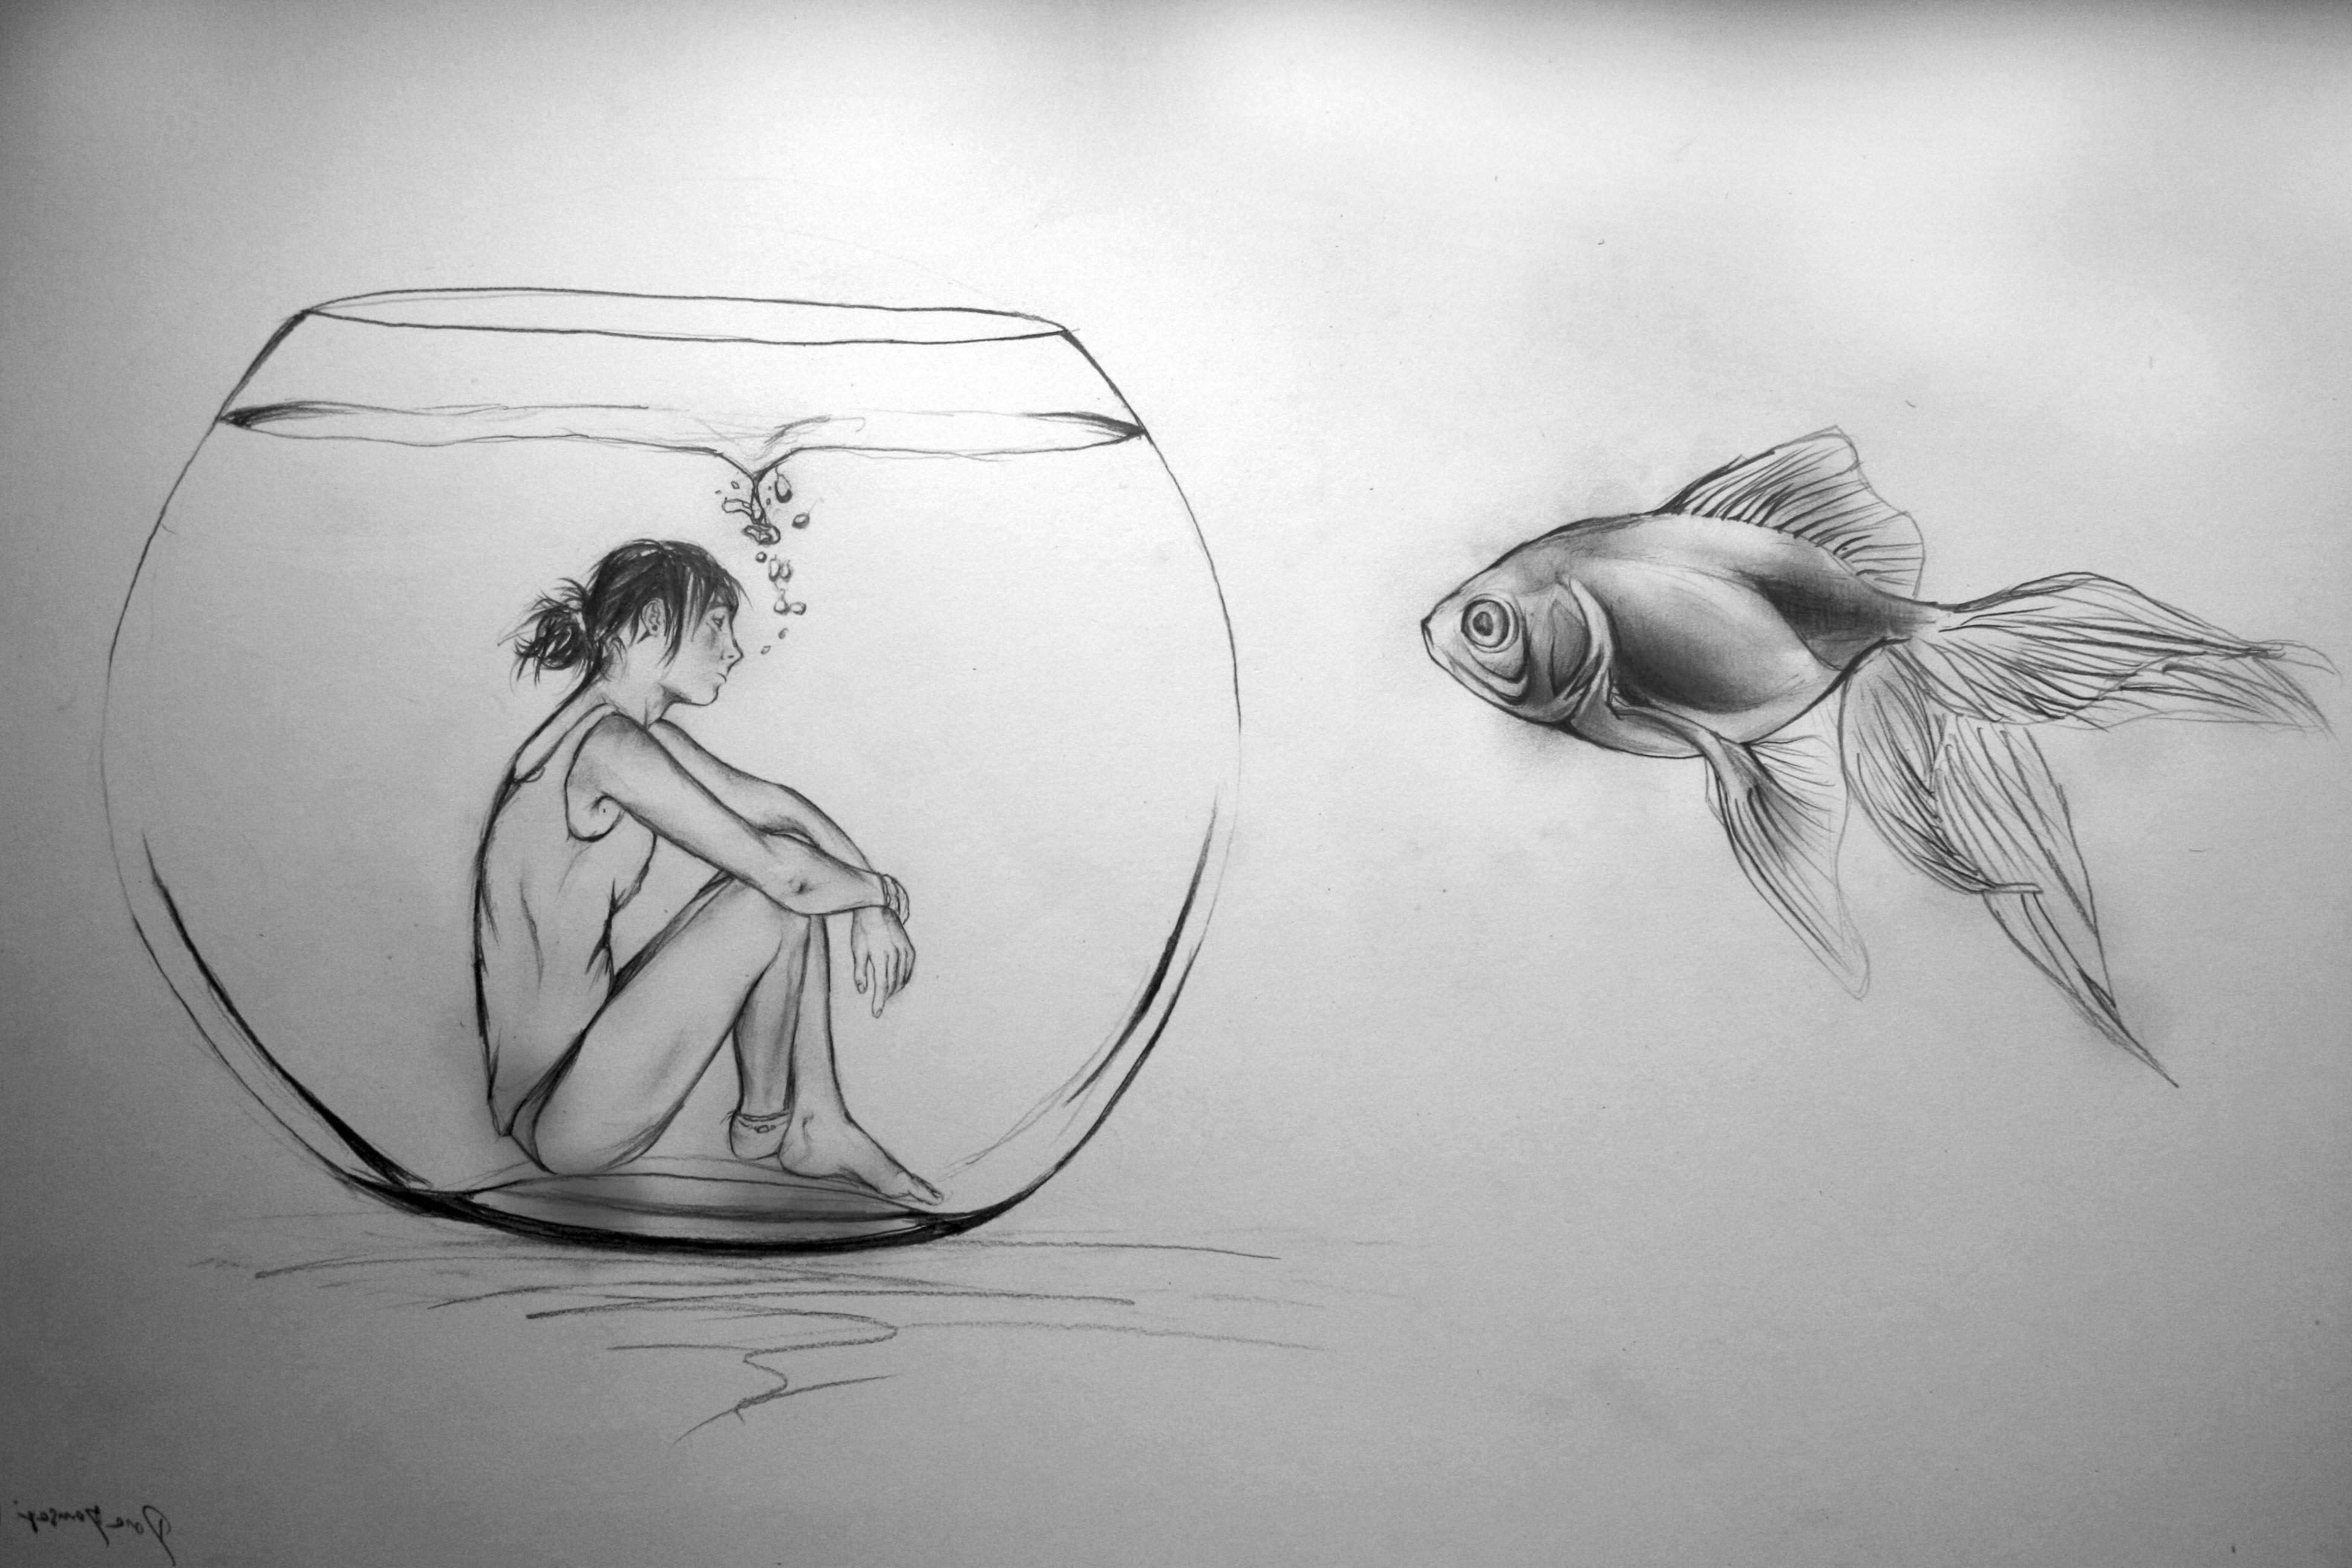 Pencil sketches simple drawing sketch